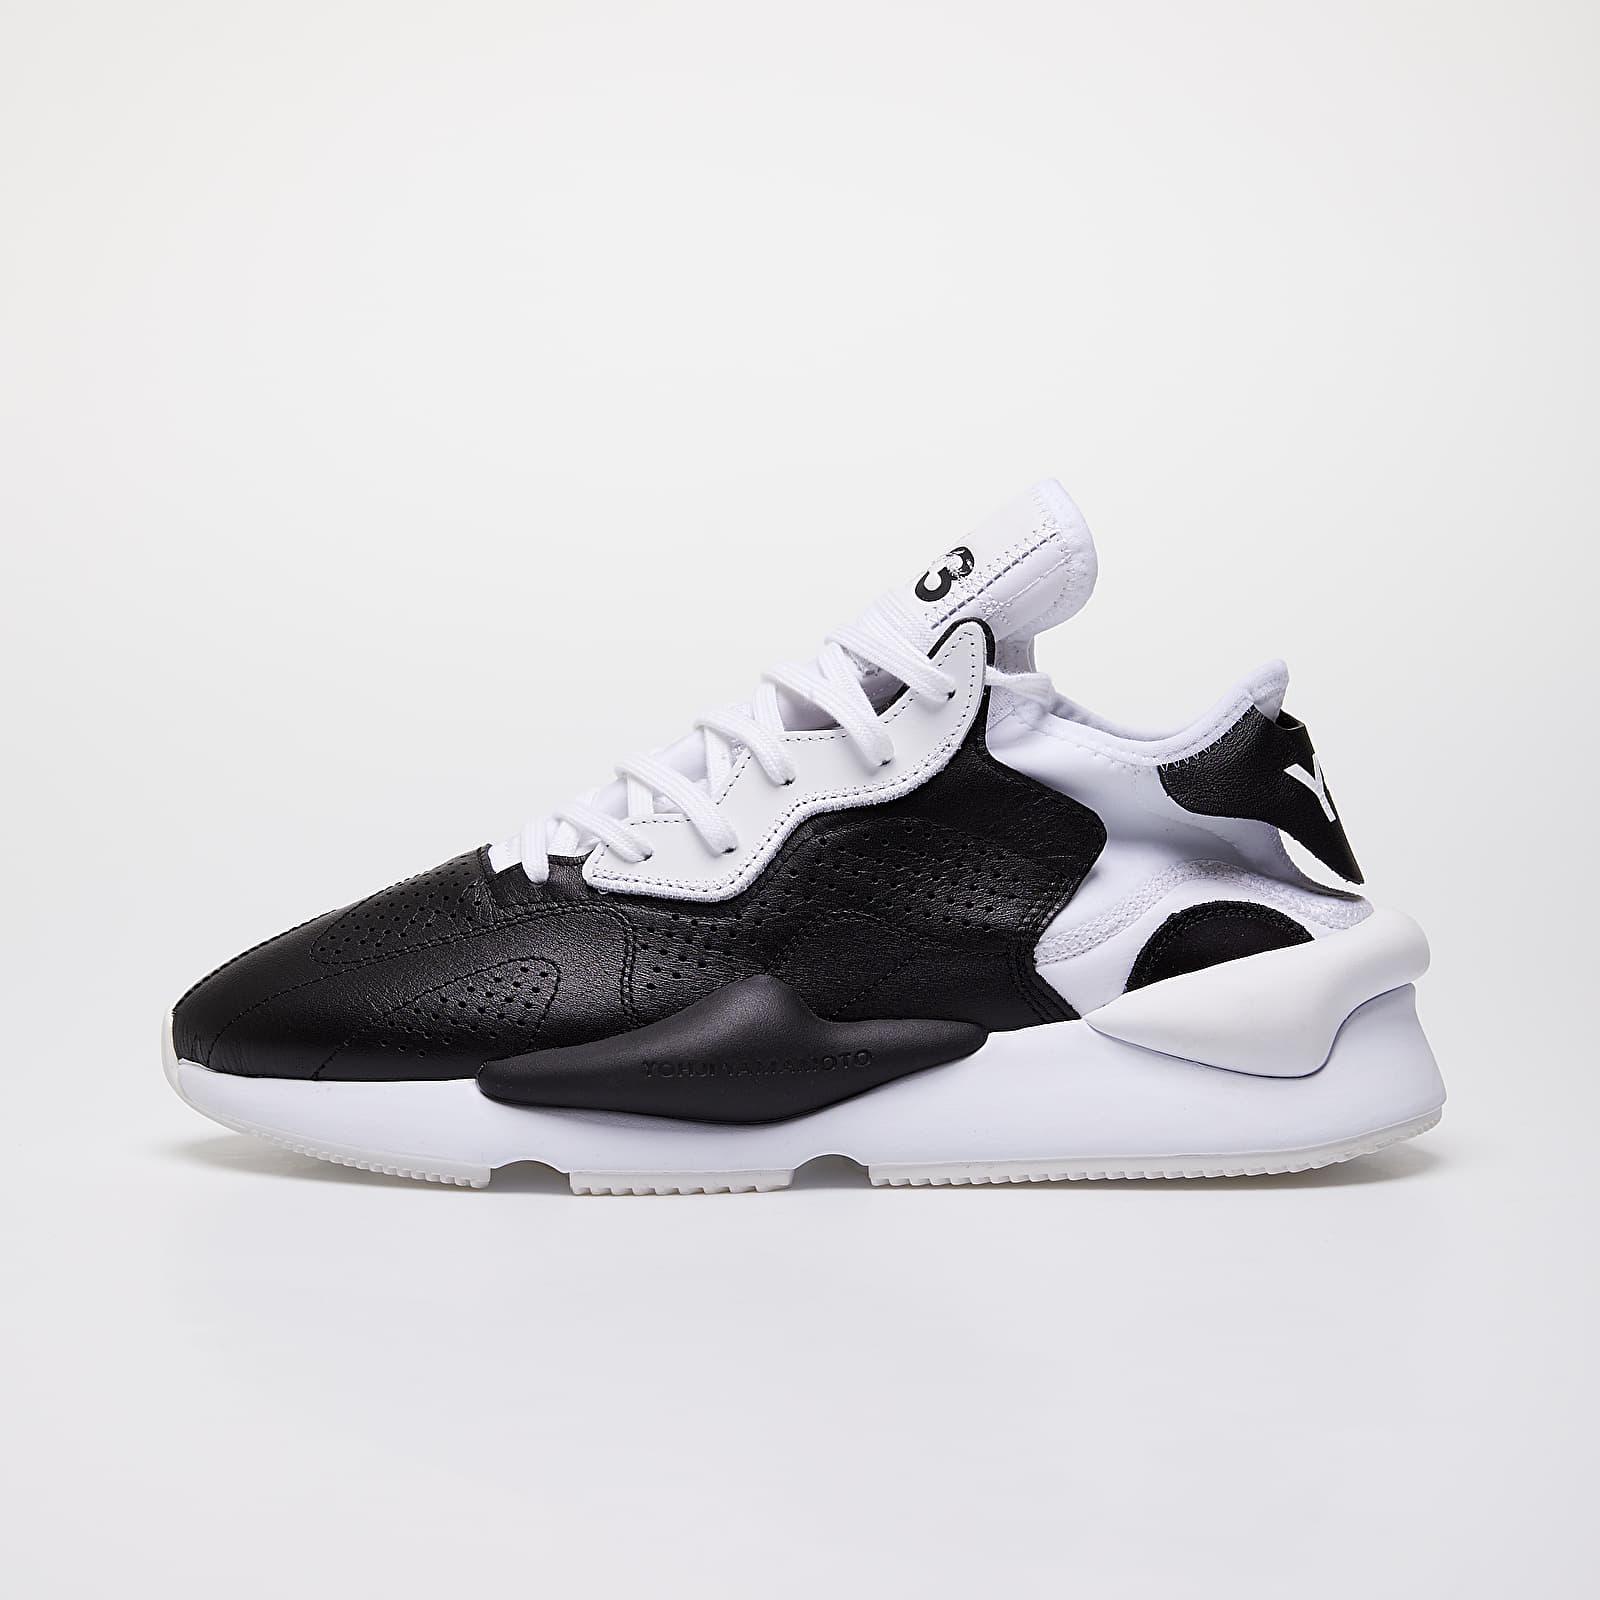 Men's shoes Y-3 Kaiwa Black/ Ftw White/ Black